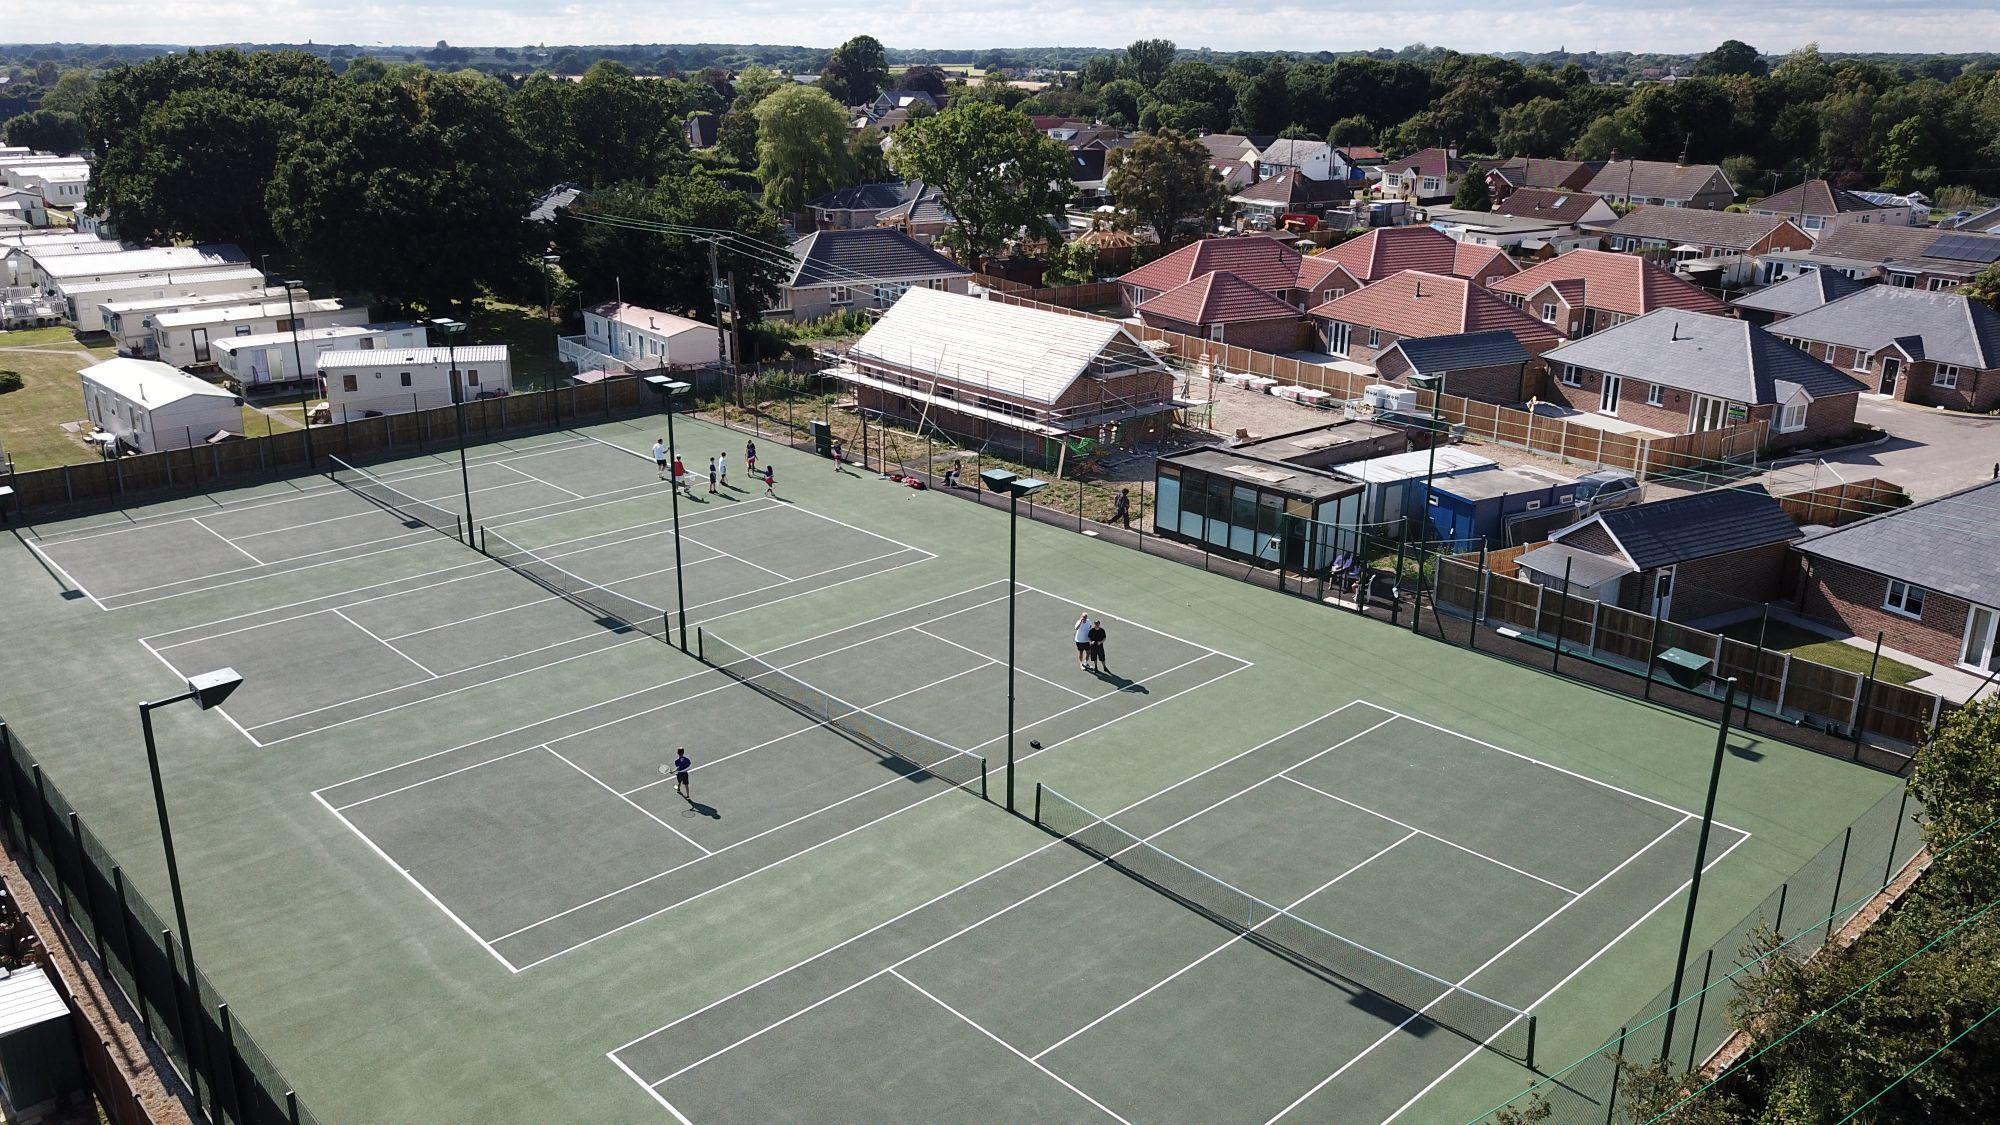 Modern asphalt courts are an ideal option for clubs requiring minimal tennis court maintenance